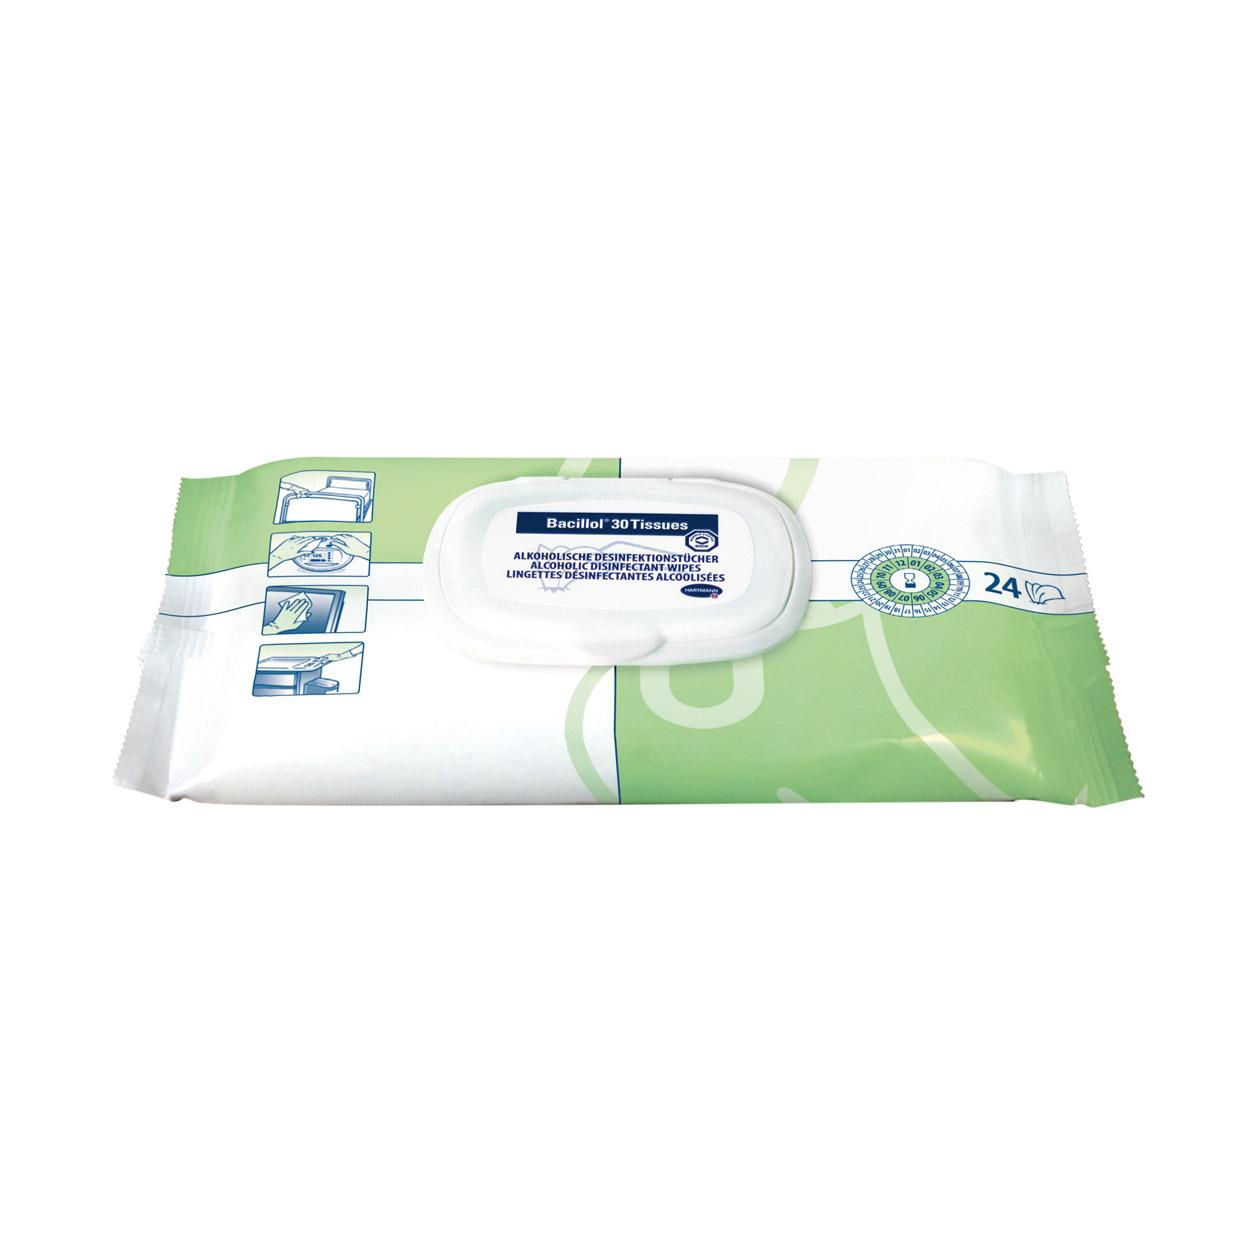 Bacillol® 30 Tissues, Flow-Pack mit 24 Tüchern